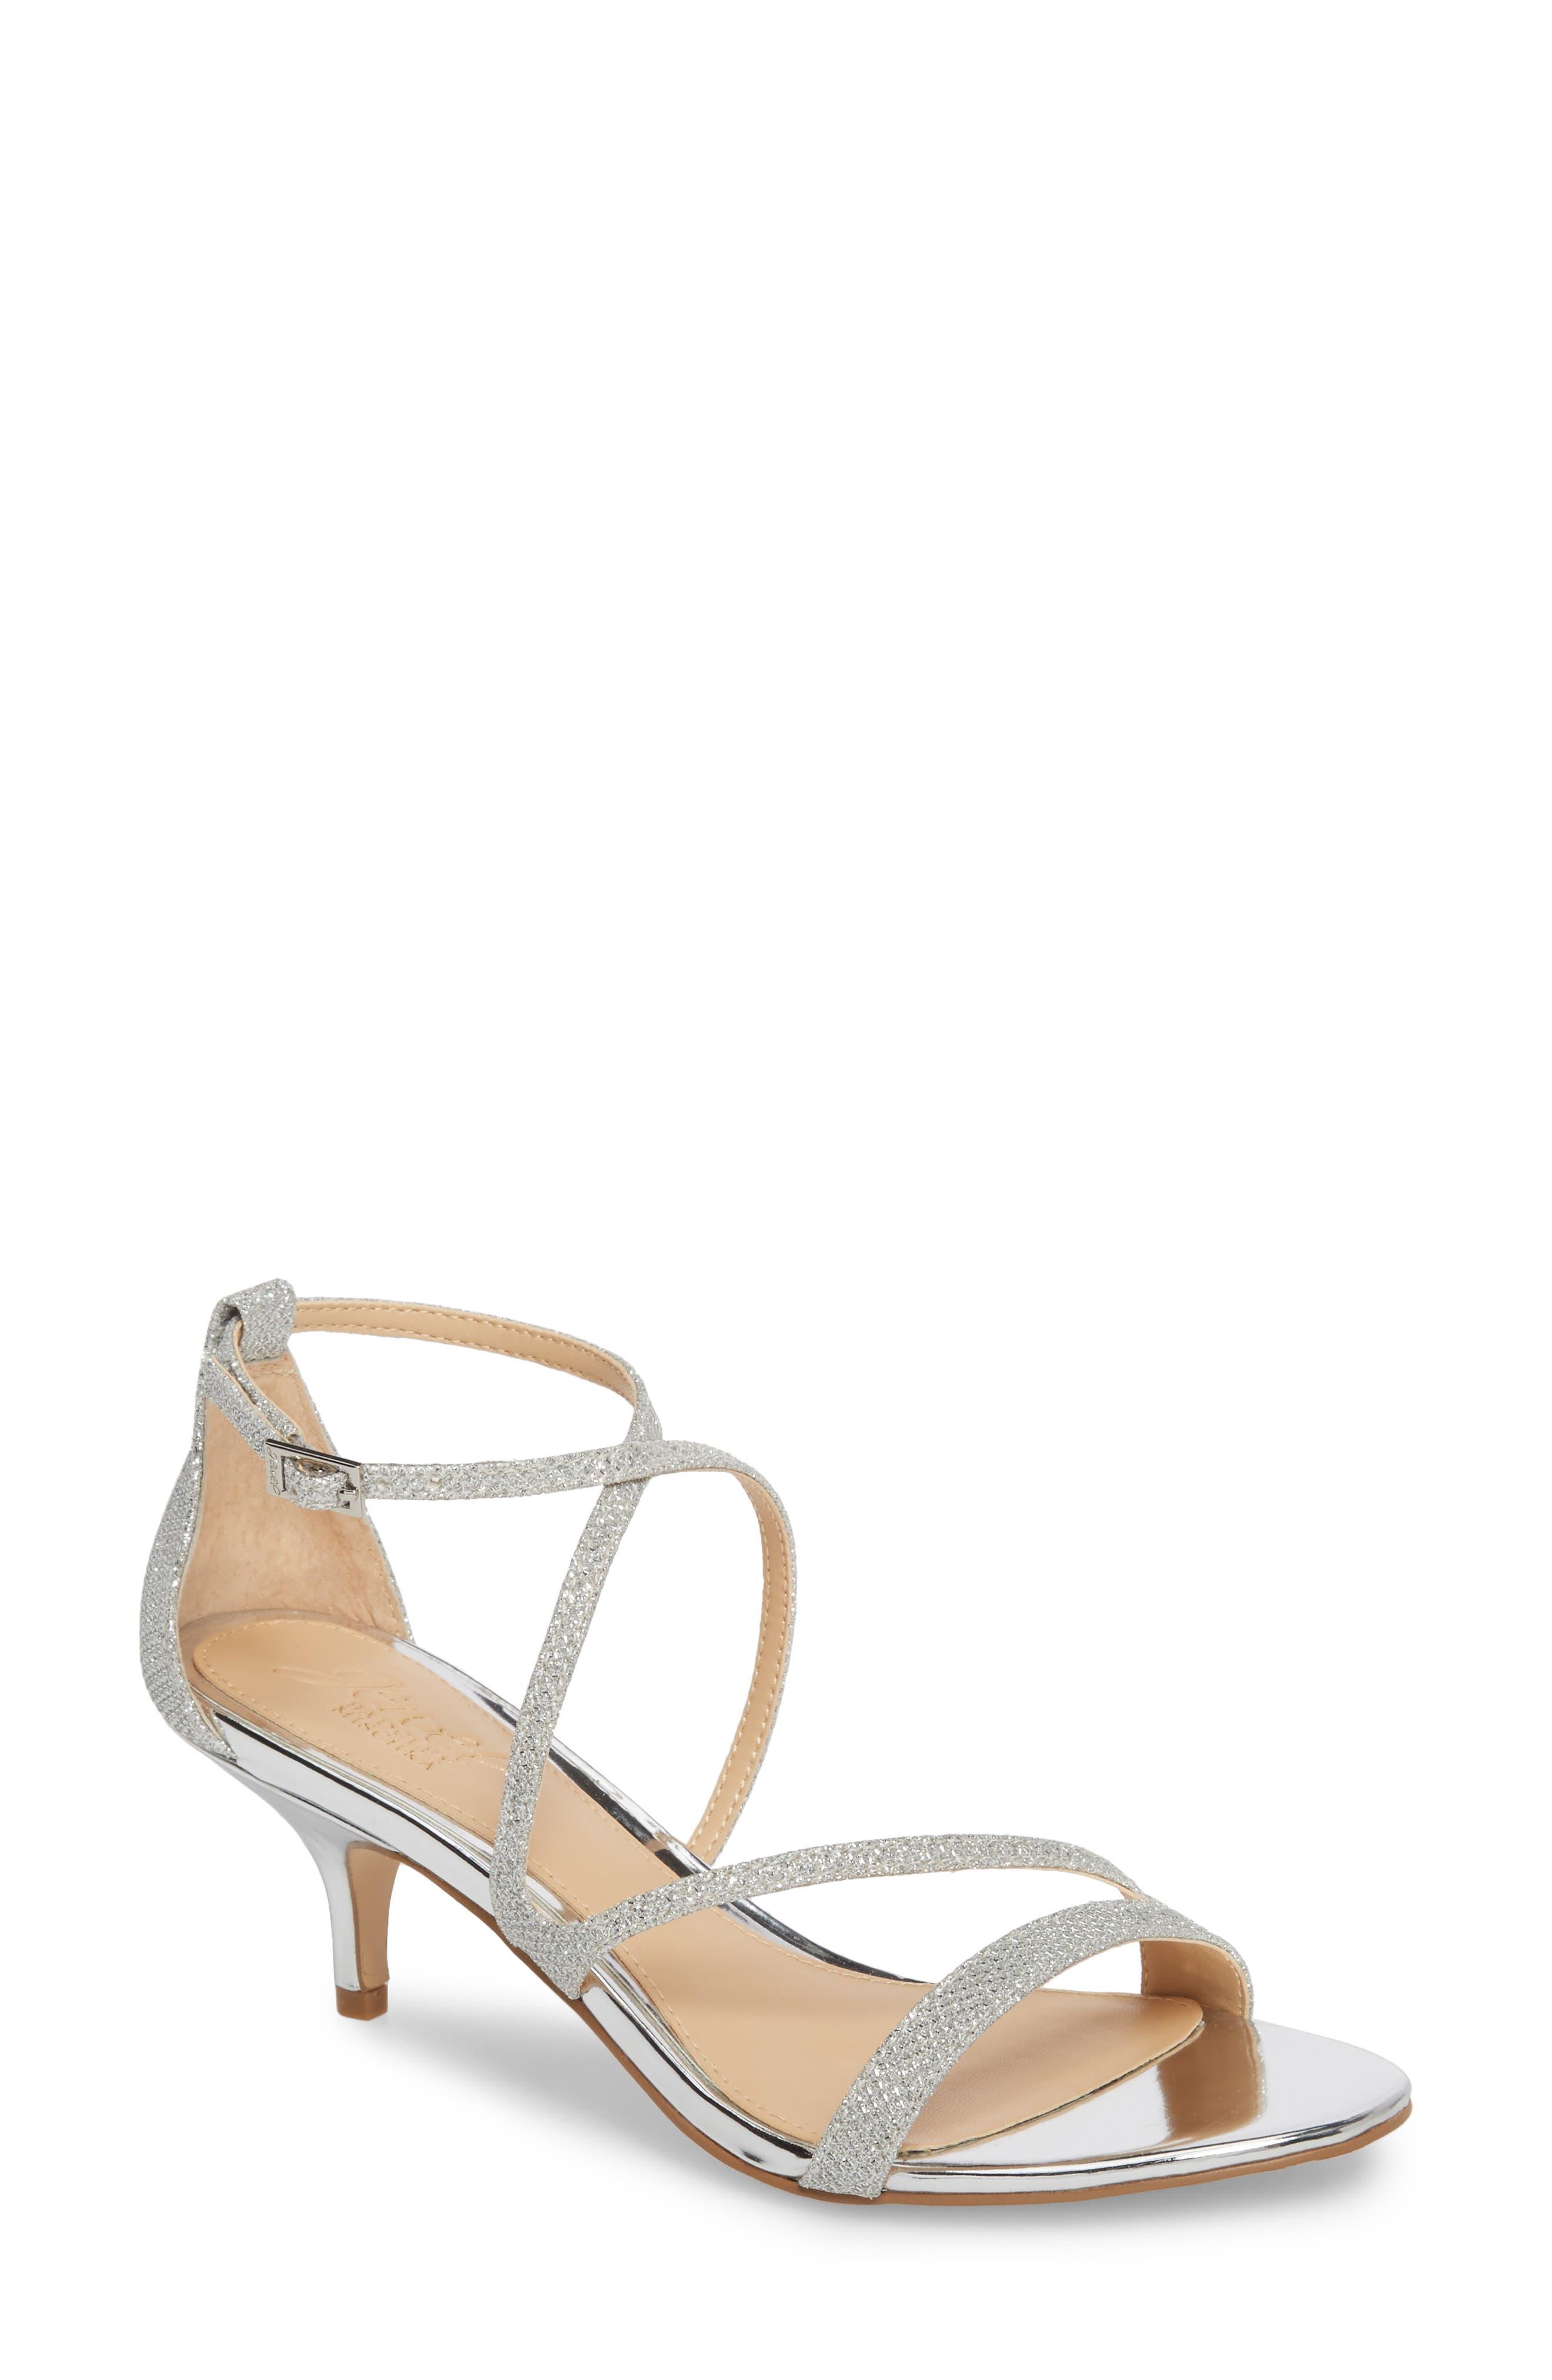 Gal Glitter Kitten Heel Sandal,                             Main thumbnail 1, color,                             SILVER GLITTER FABRIC